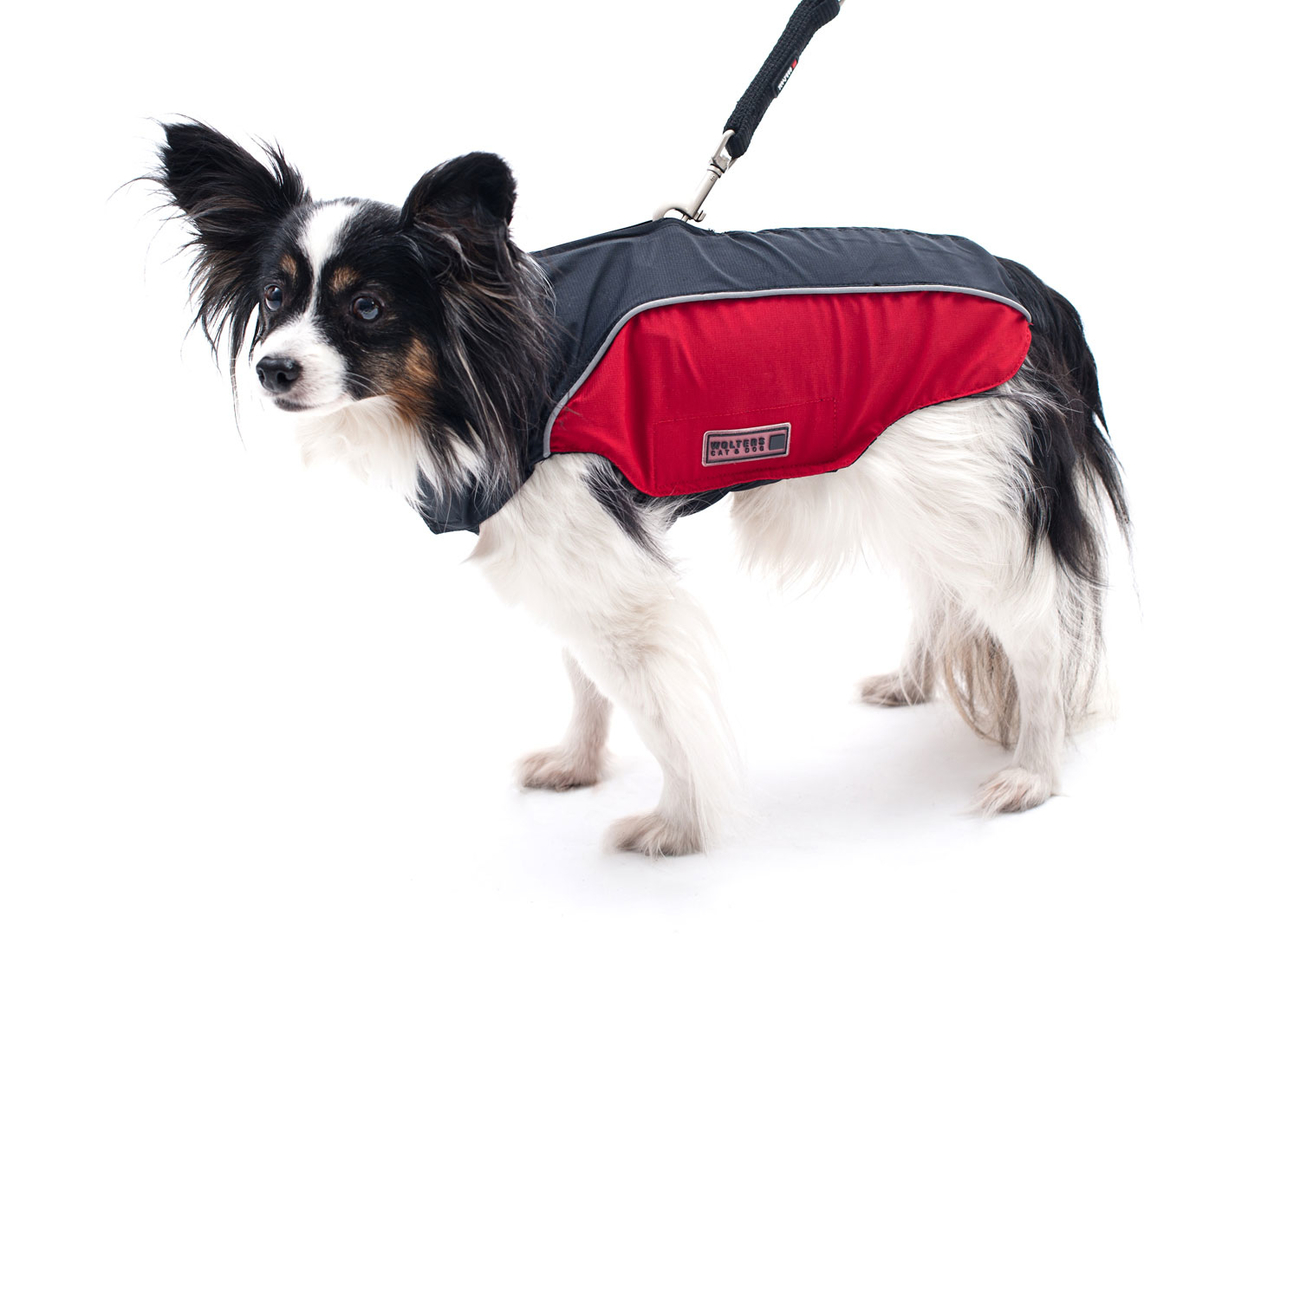 Wolters Regenjacke für Hunde Easy Rain, Bild 11